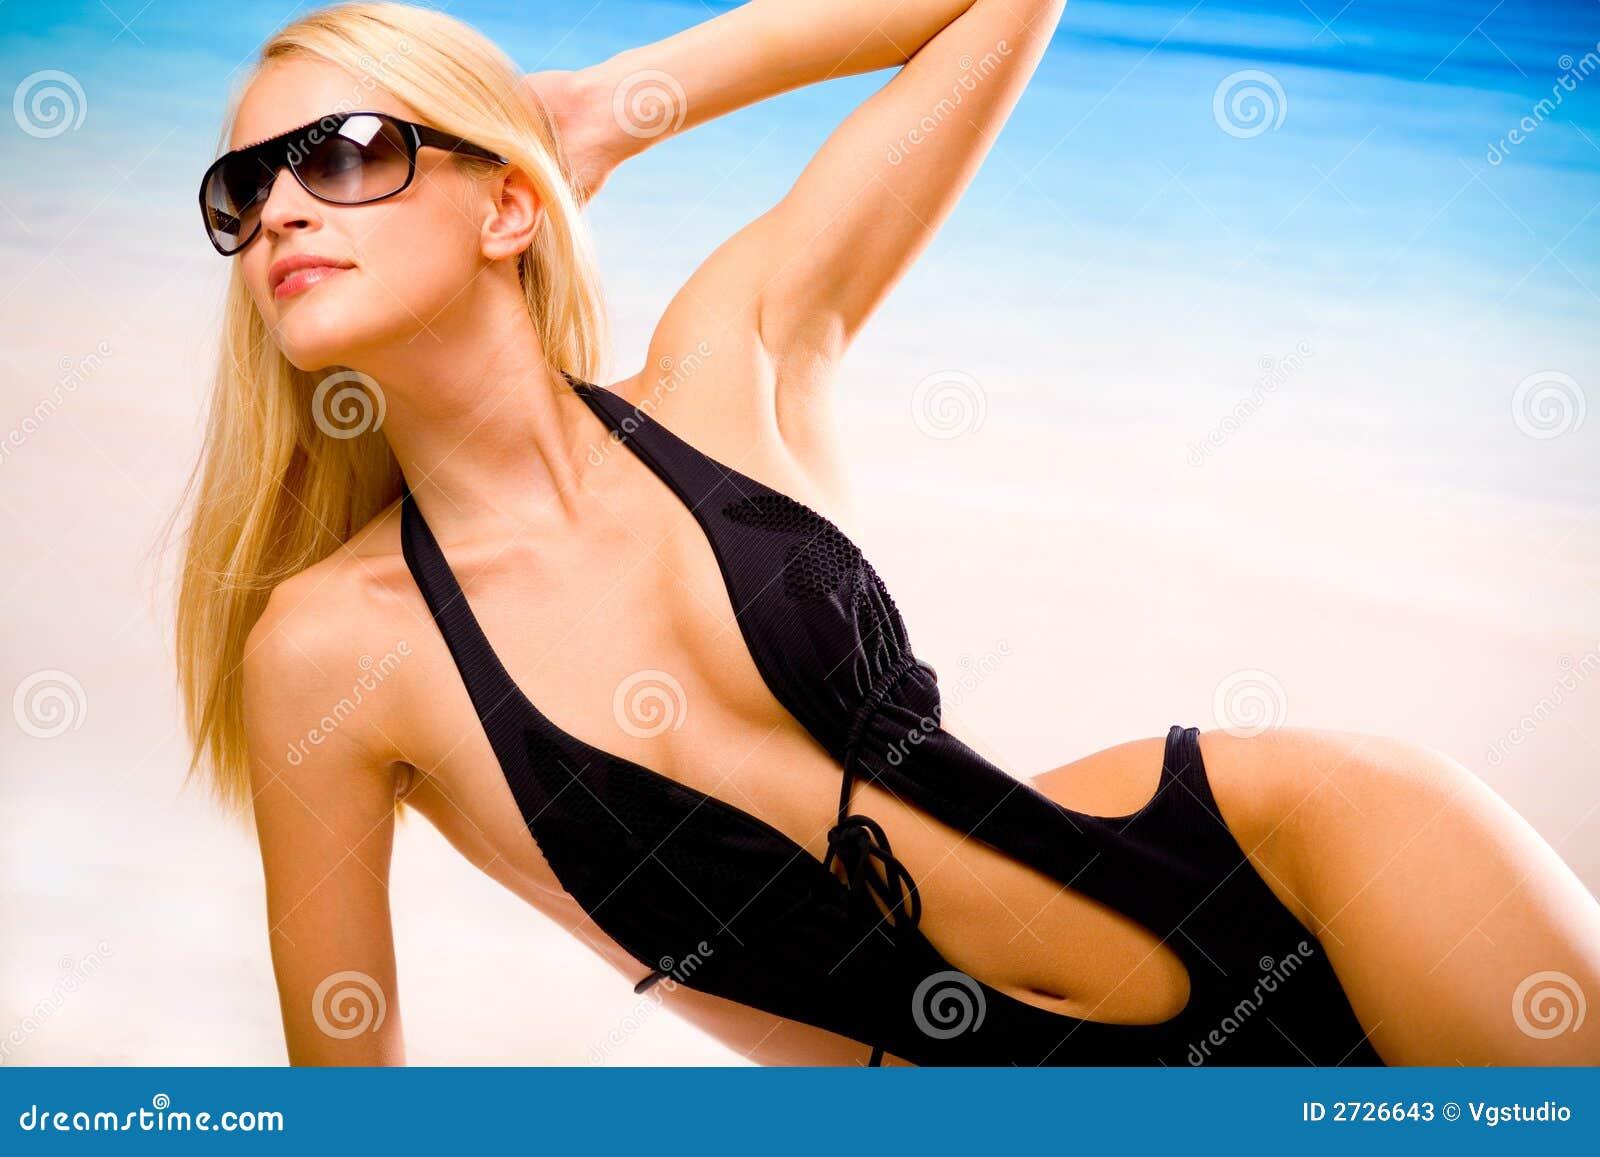 tanned sex videos